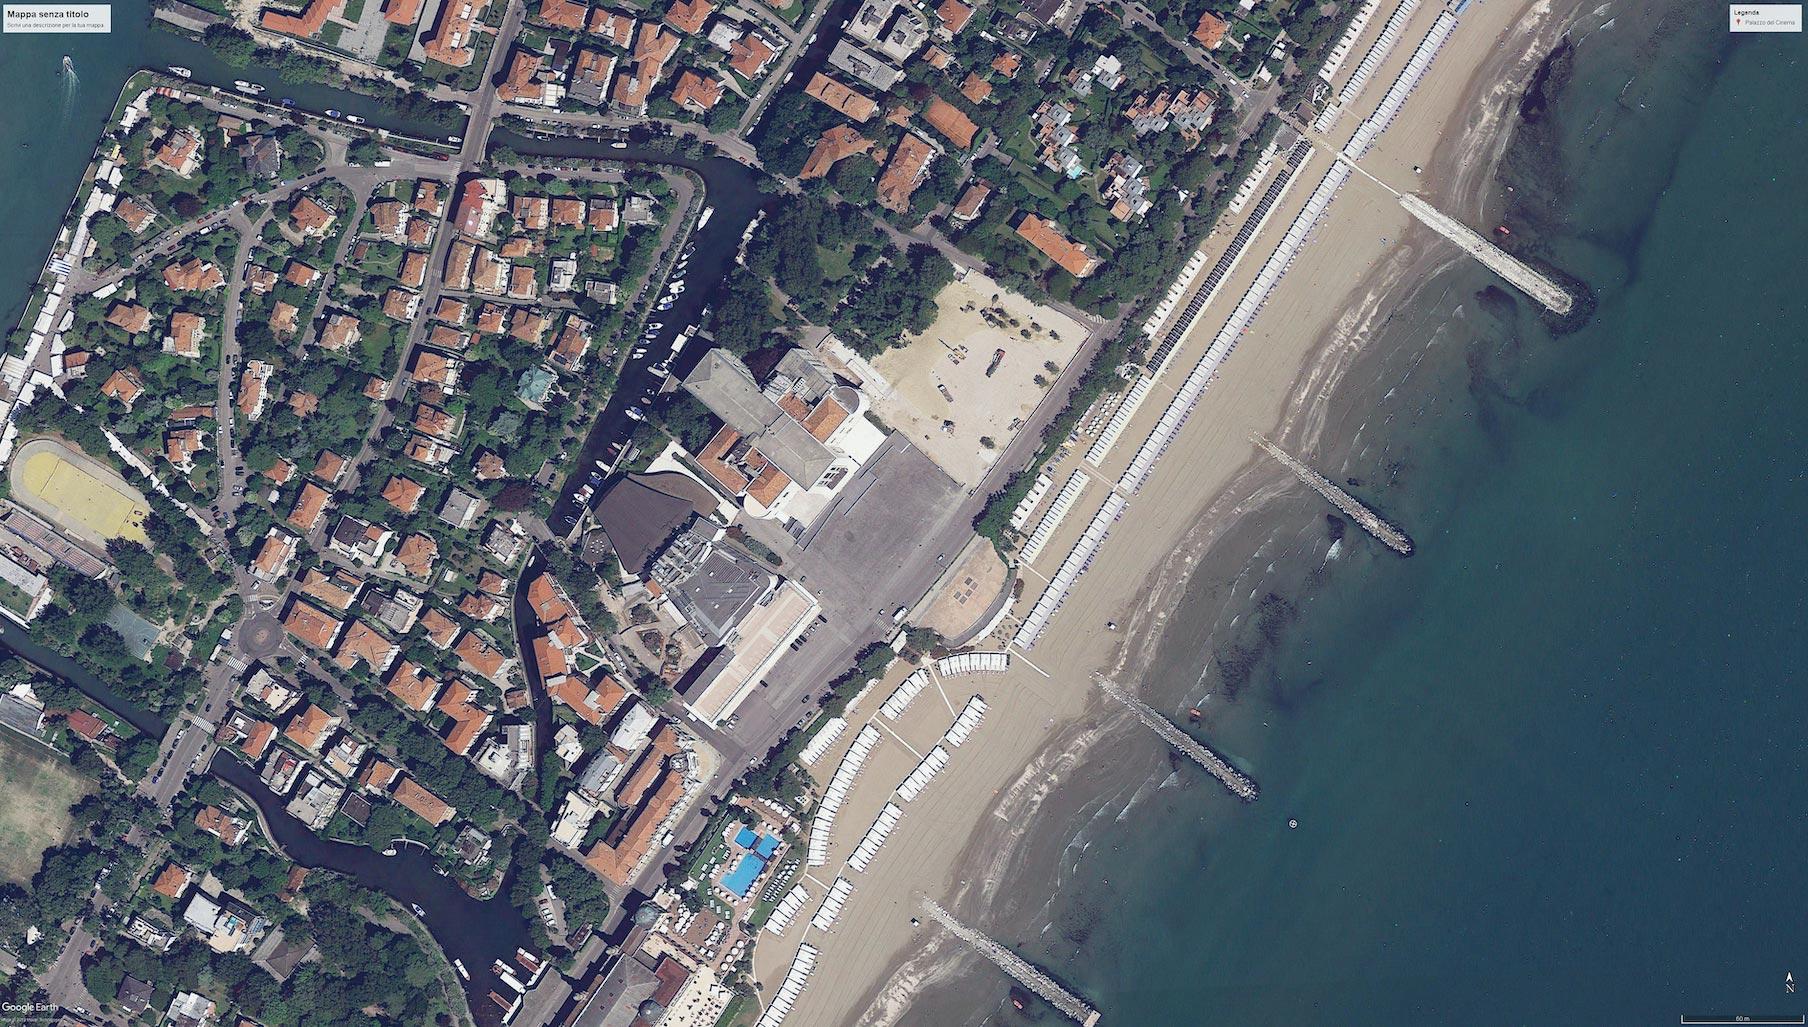 Vista satellitare Piazza Cinema Venezia